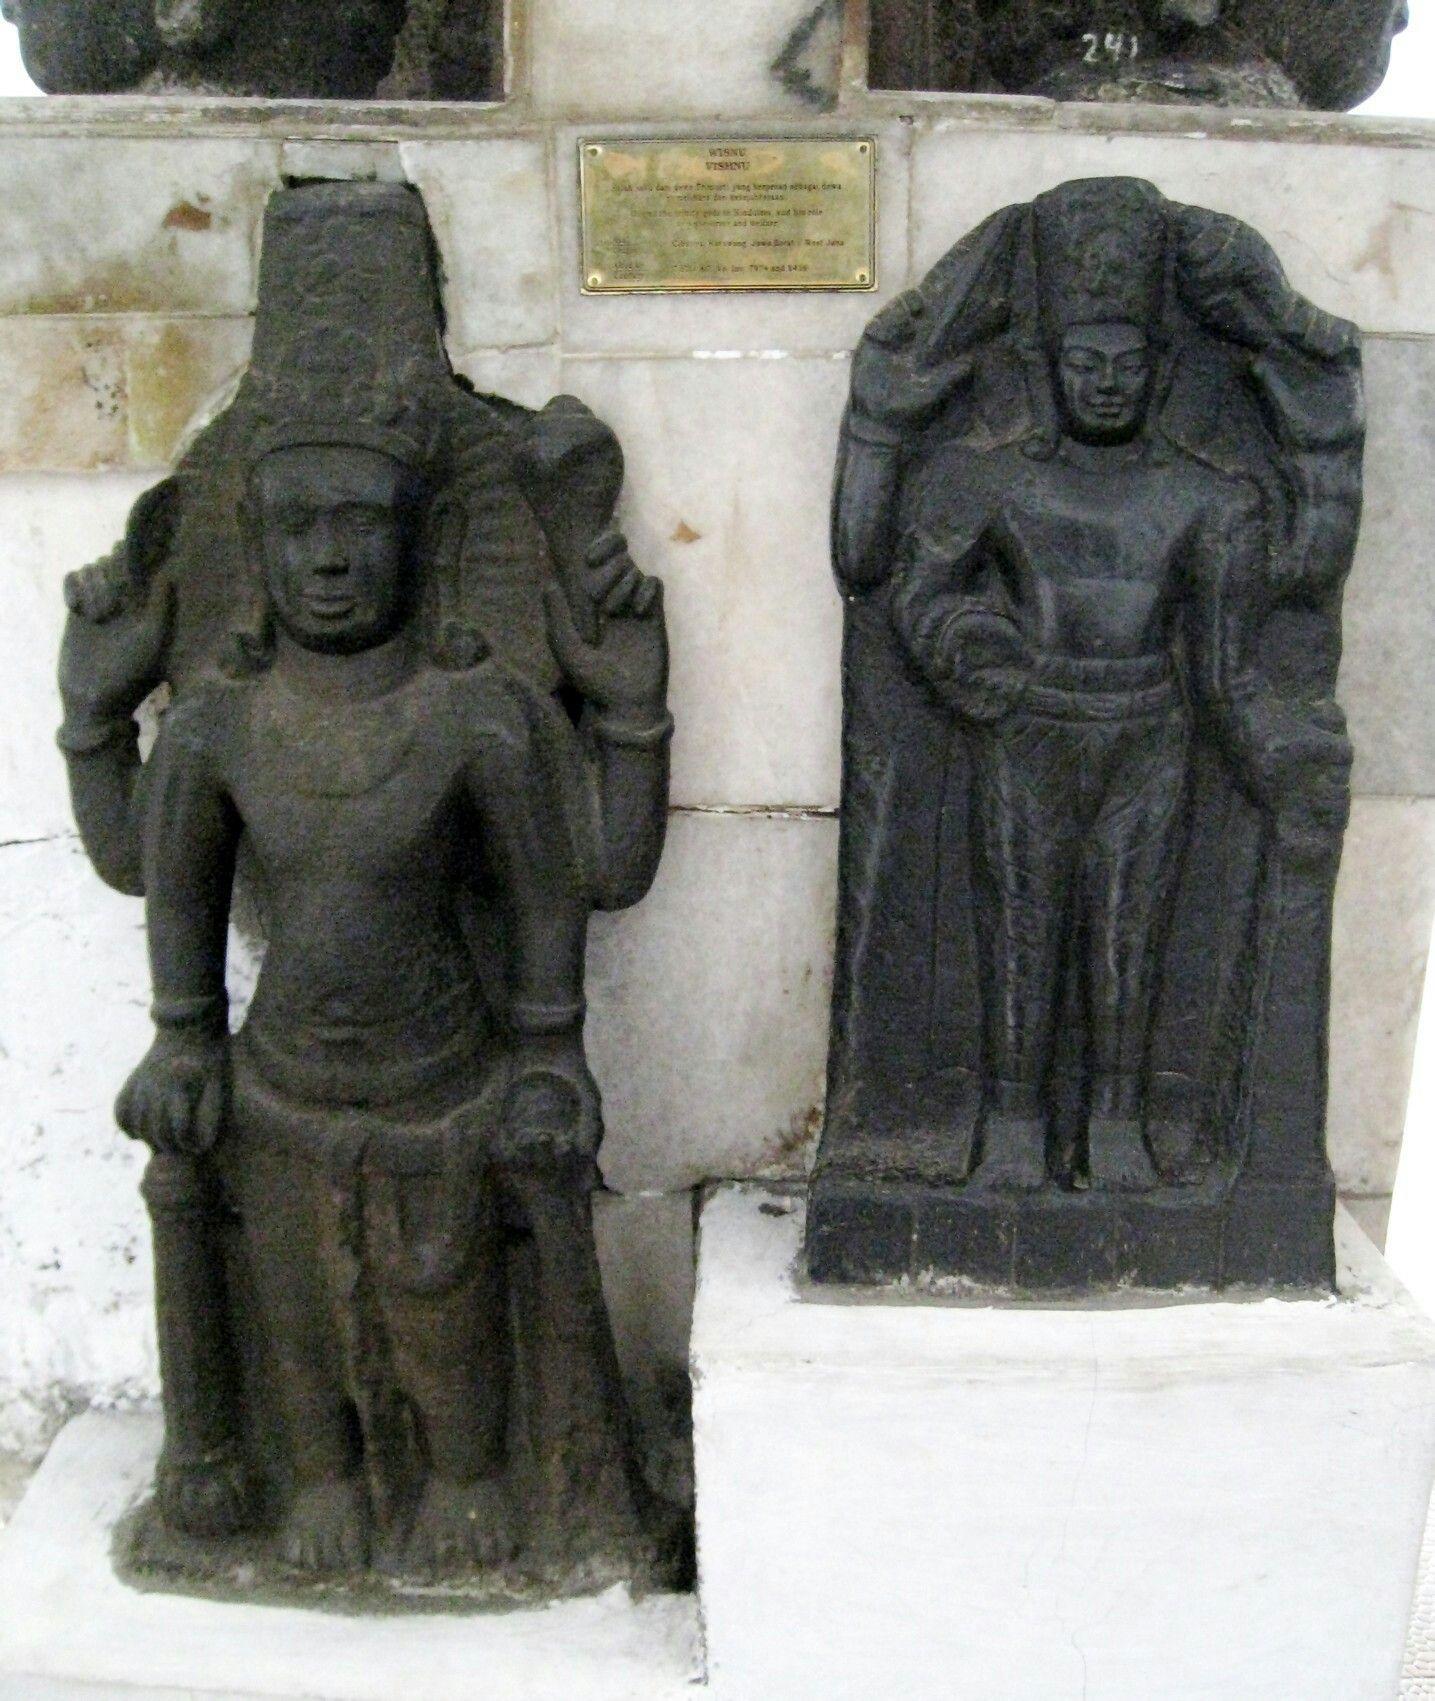 Two Vishnu statues discovered in Cibuaya site, Karawang